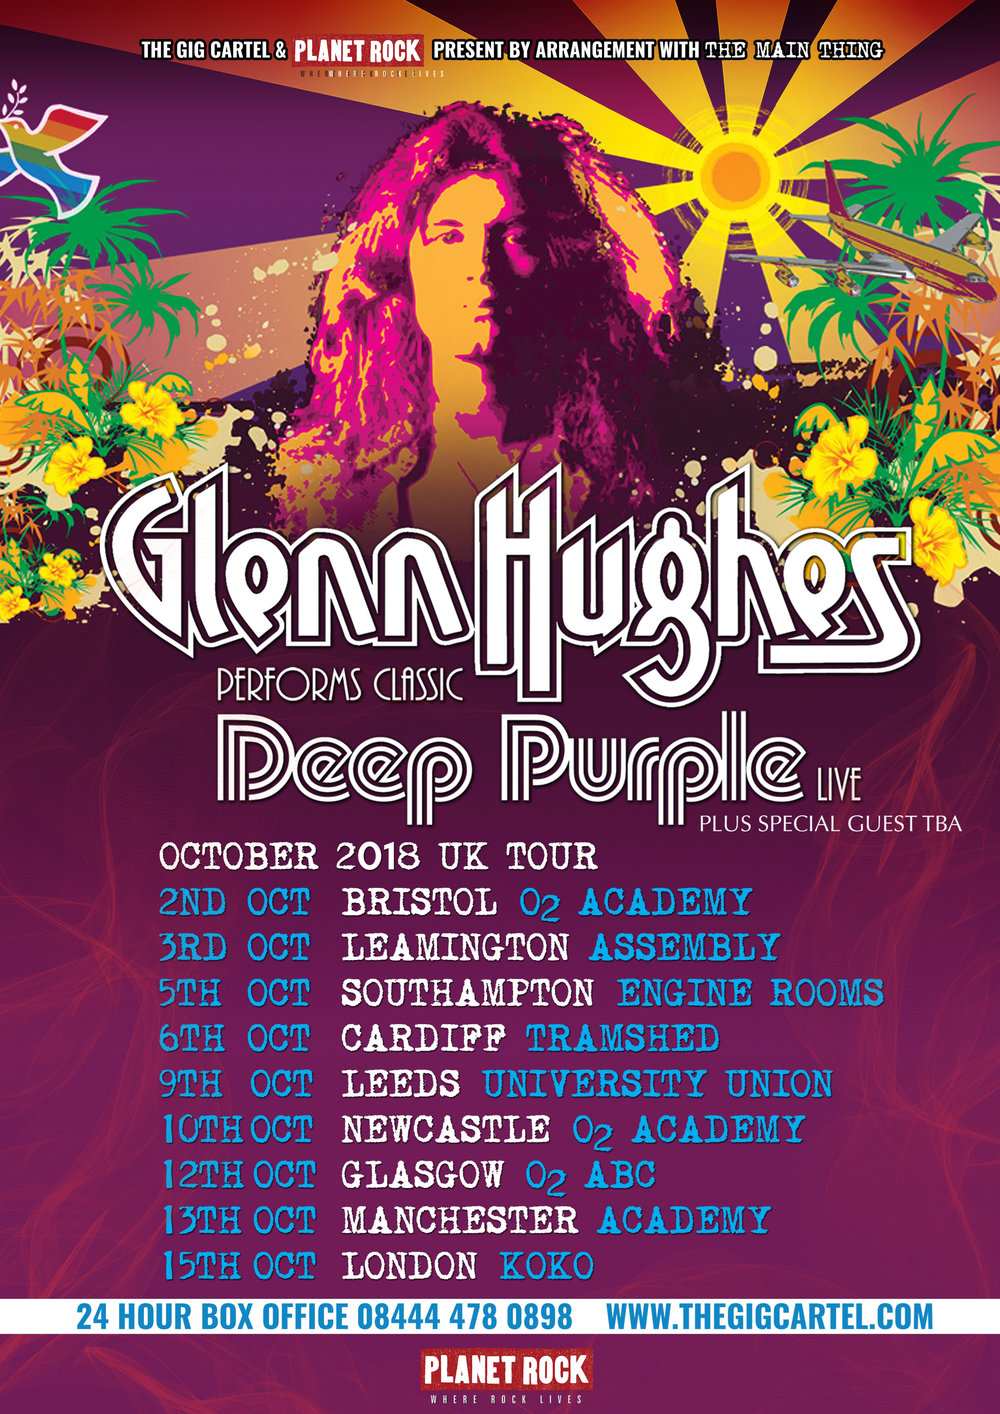 Glenn_Hughes-tour-poster-2018_classic_deep_purple.jpg